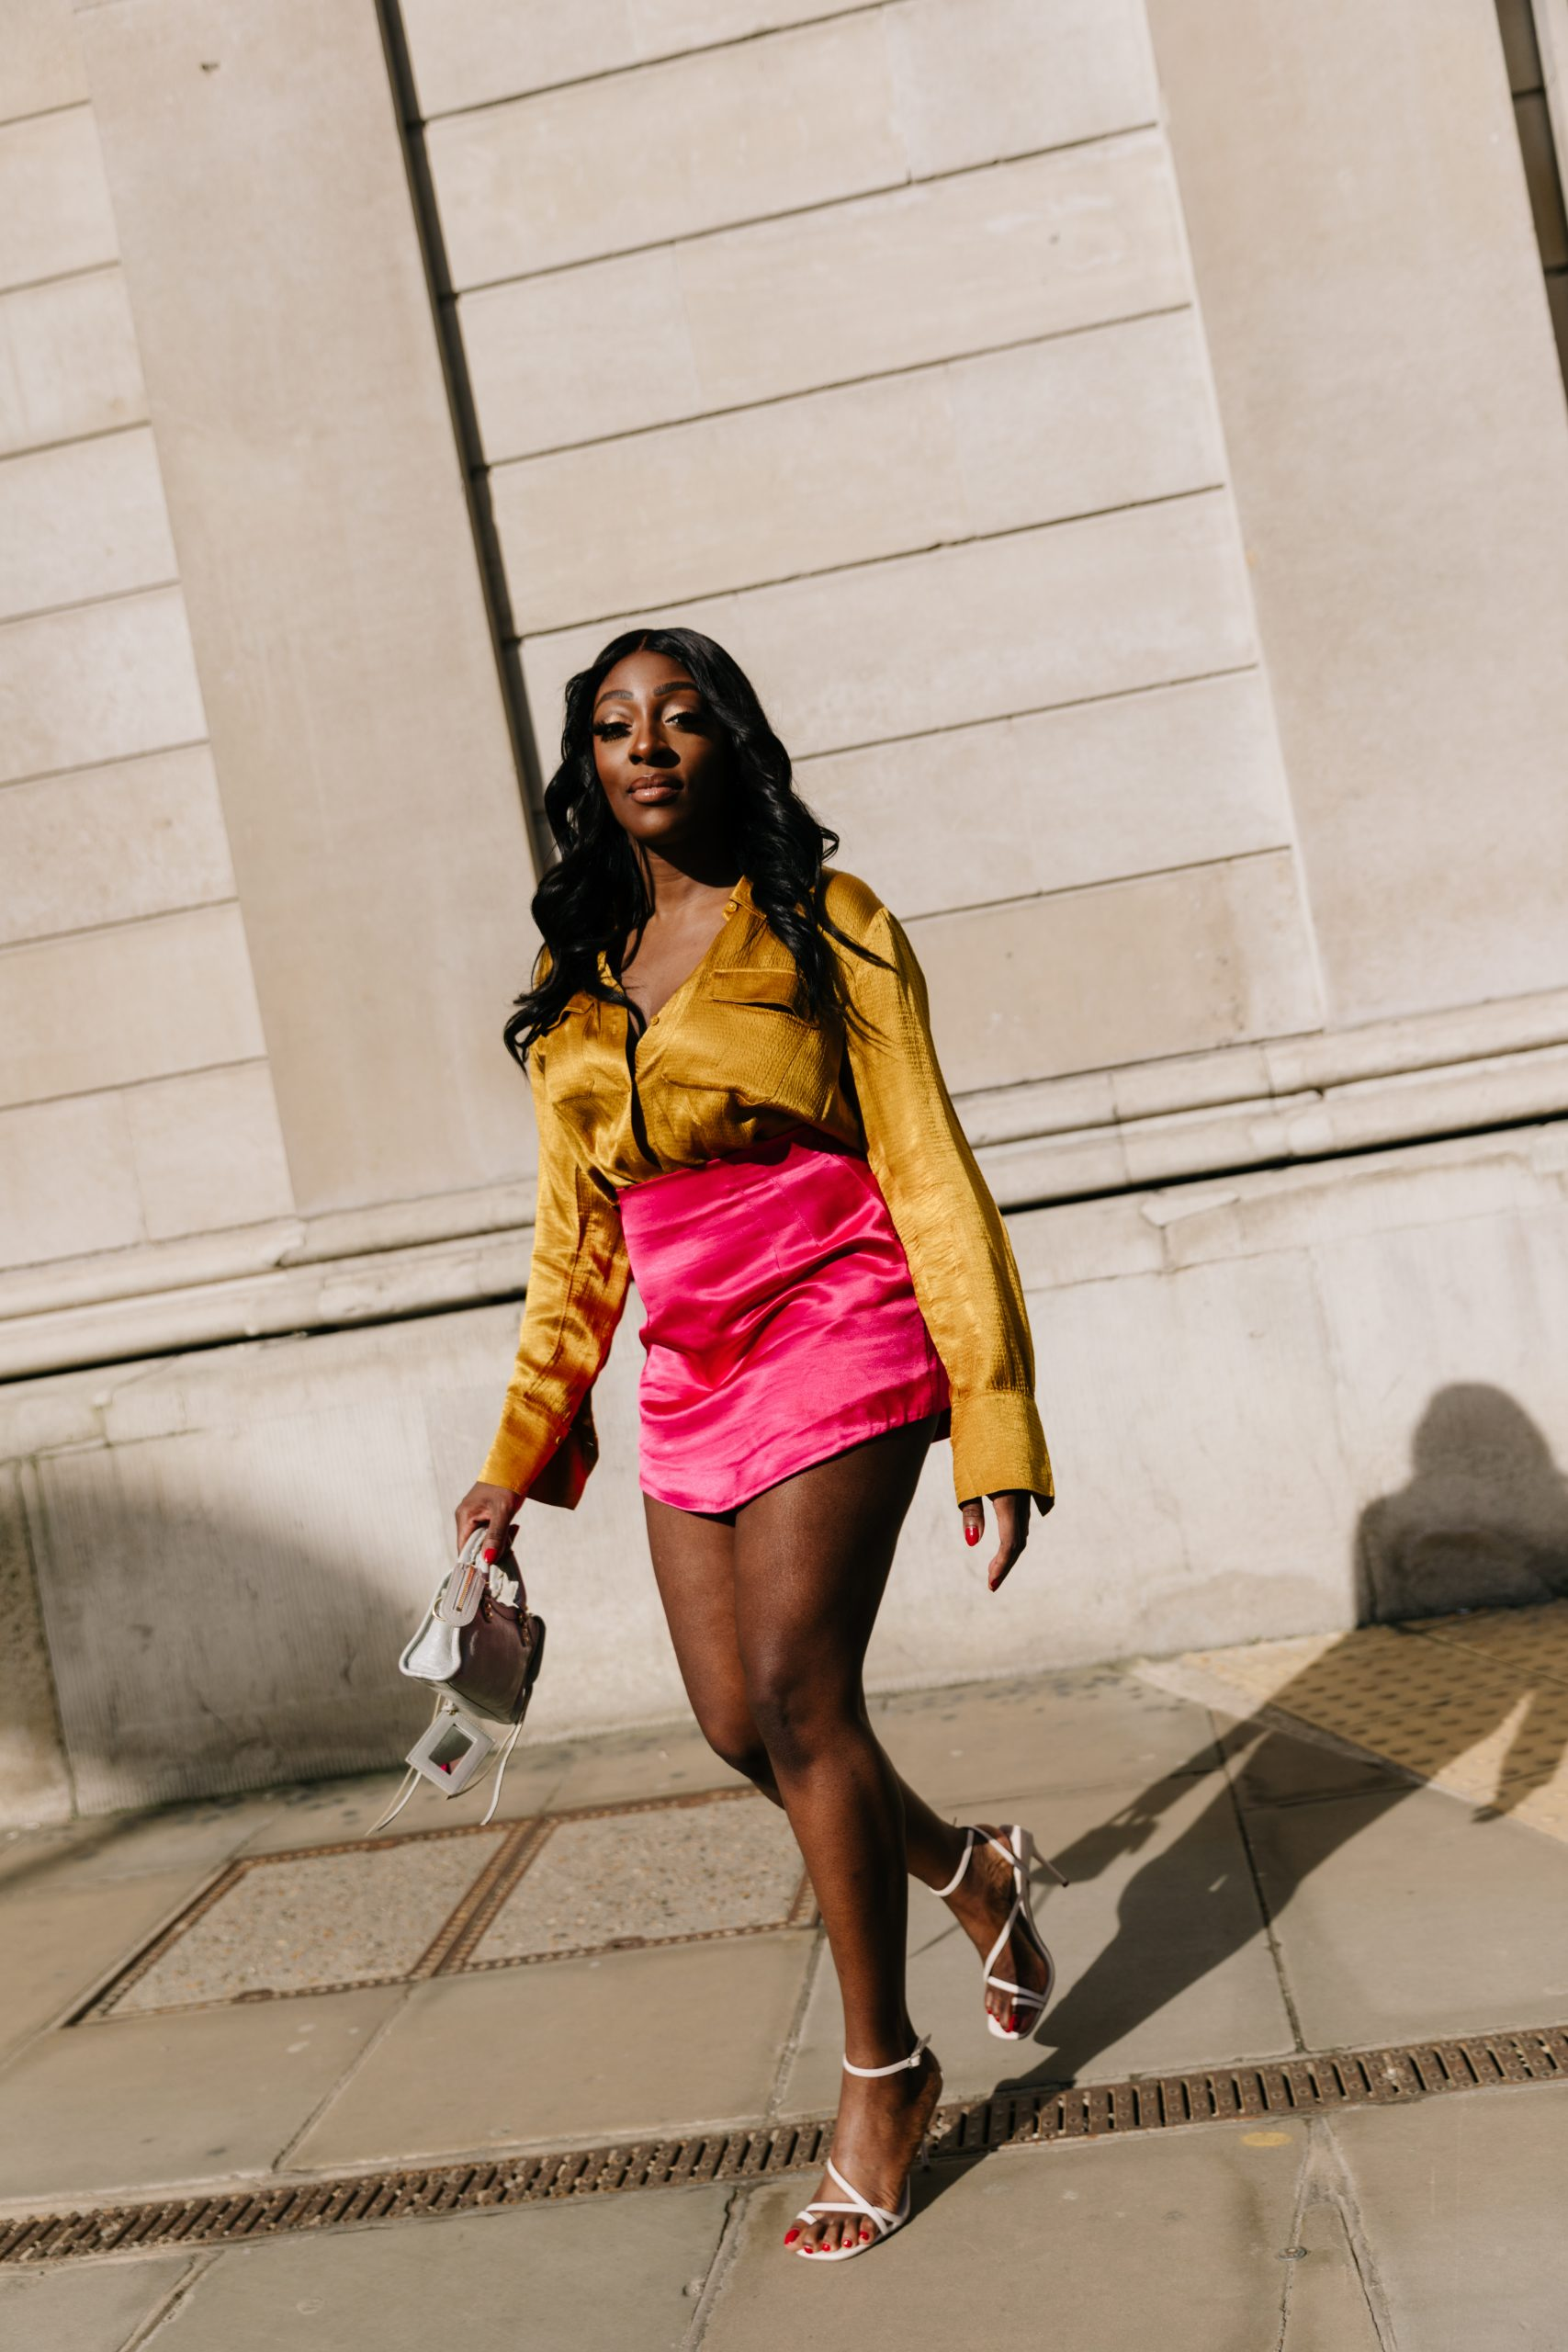 yellow &Other stories silk shirt - pink mini skirt Zara - Balenciaga Mini City bag - Top Shop sandals - Tasha Antwi